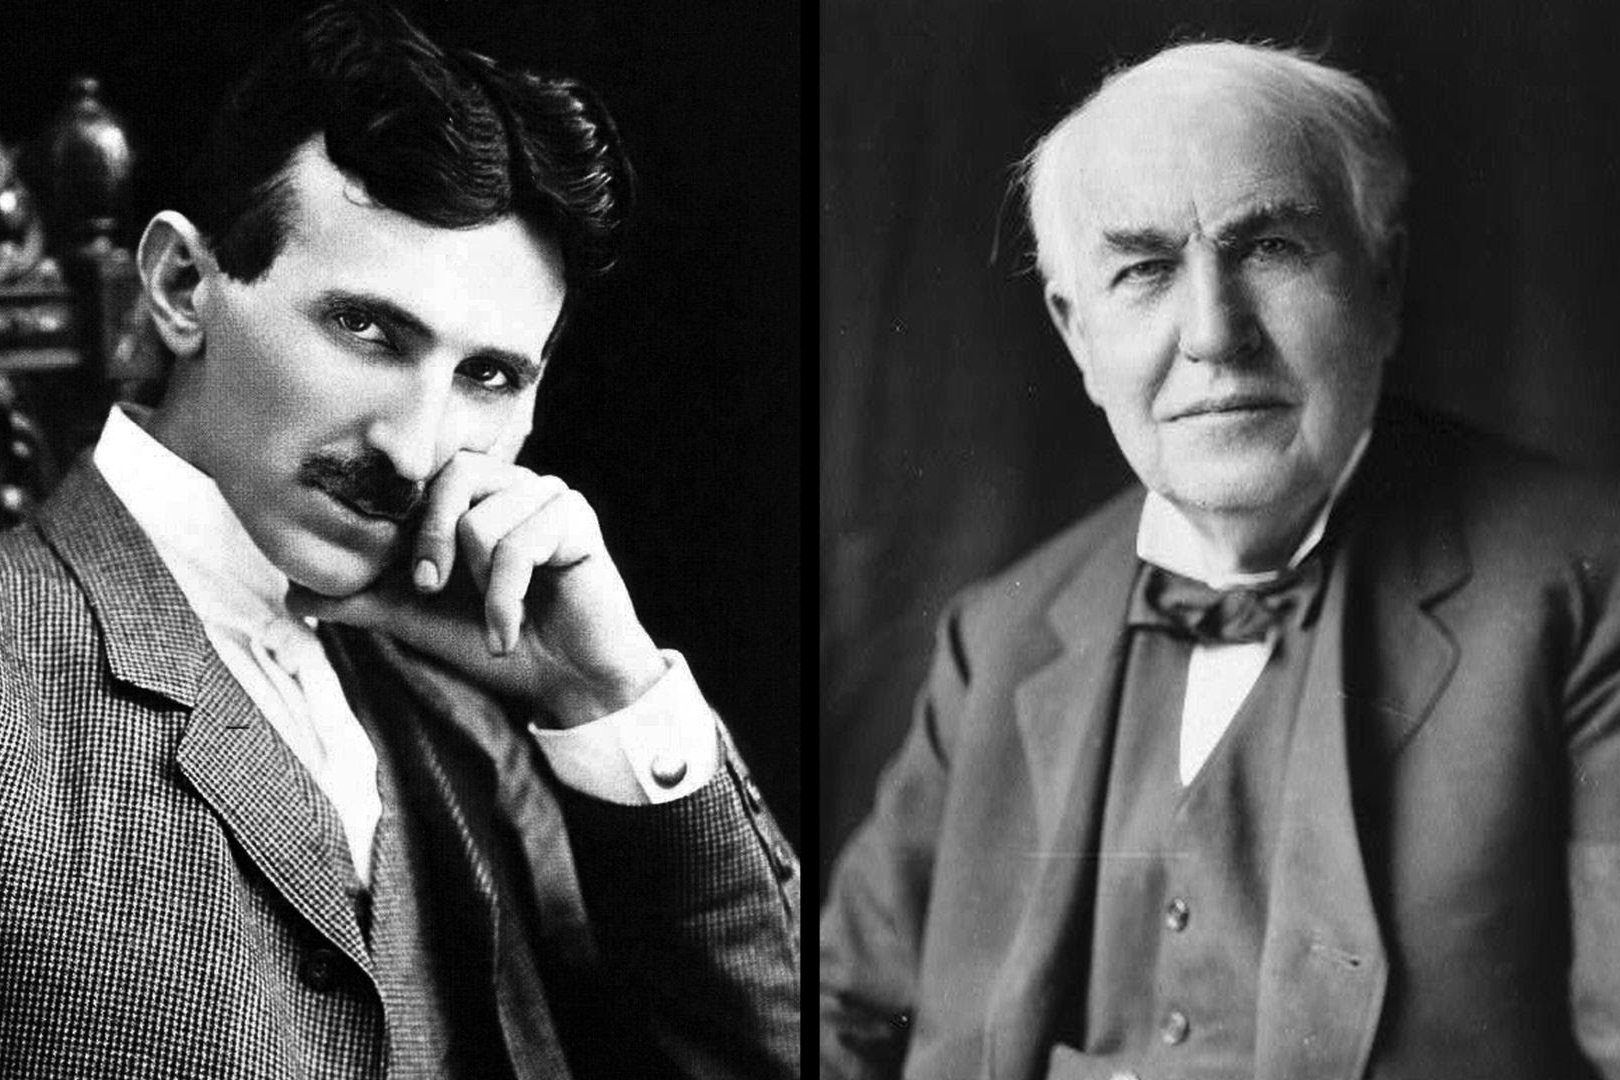 Gênio vs Gênio #1: a rivalidade elétrica entre Thomas Edison e Nikola Tesla